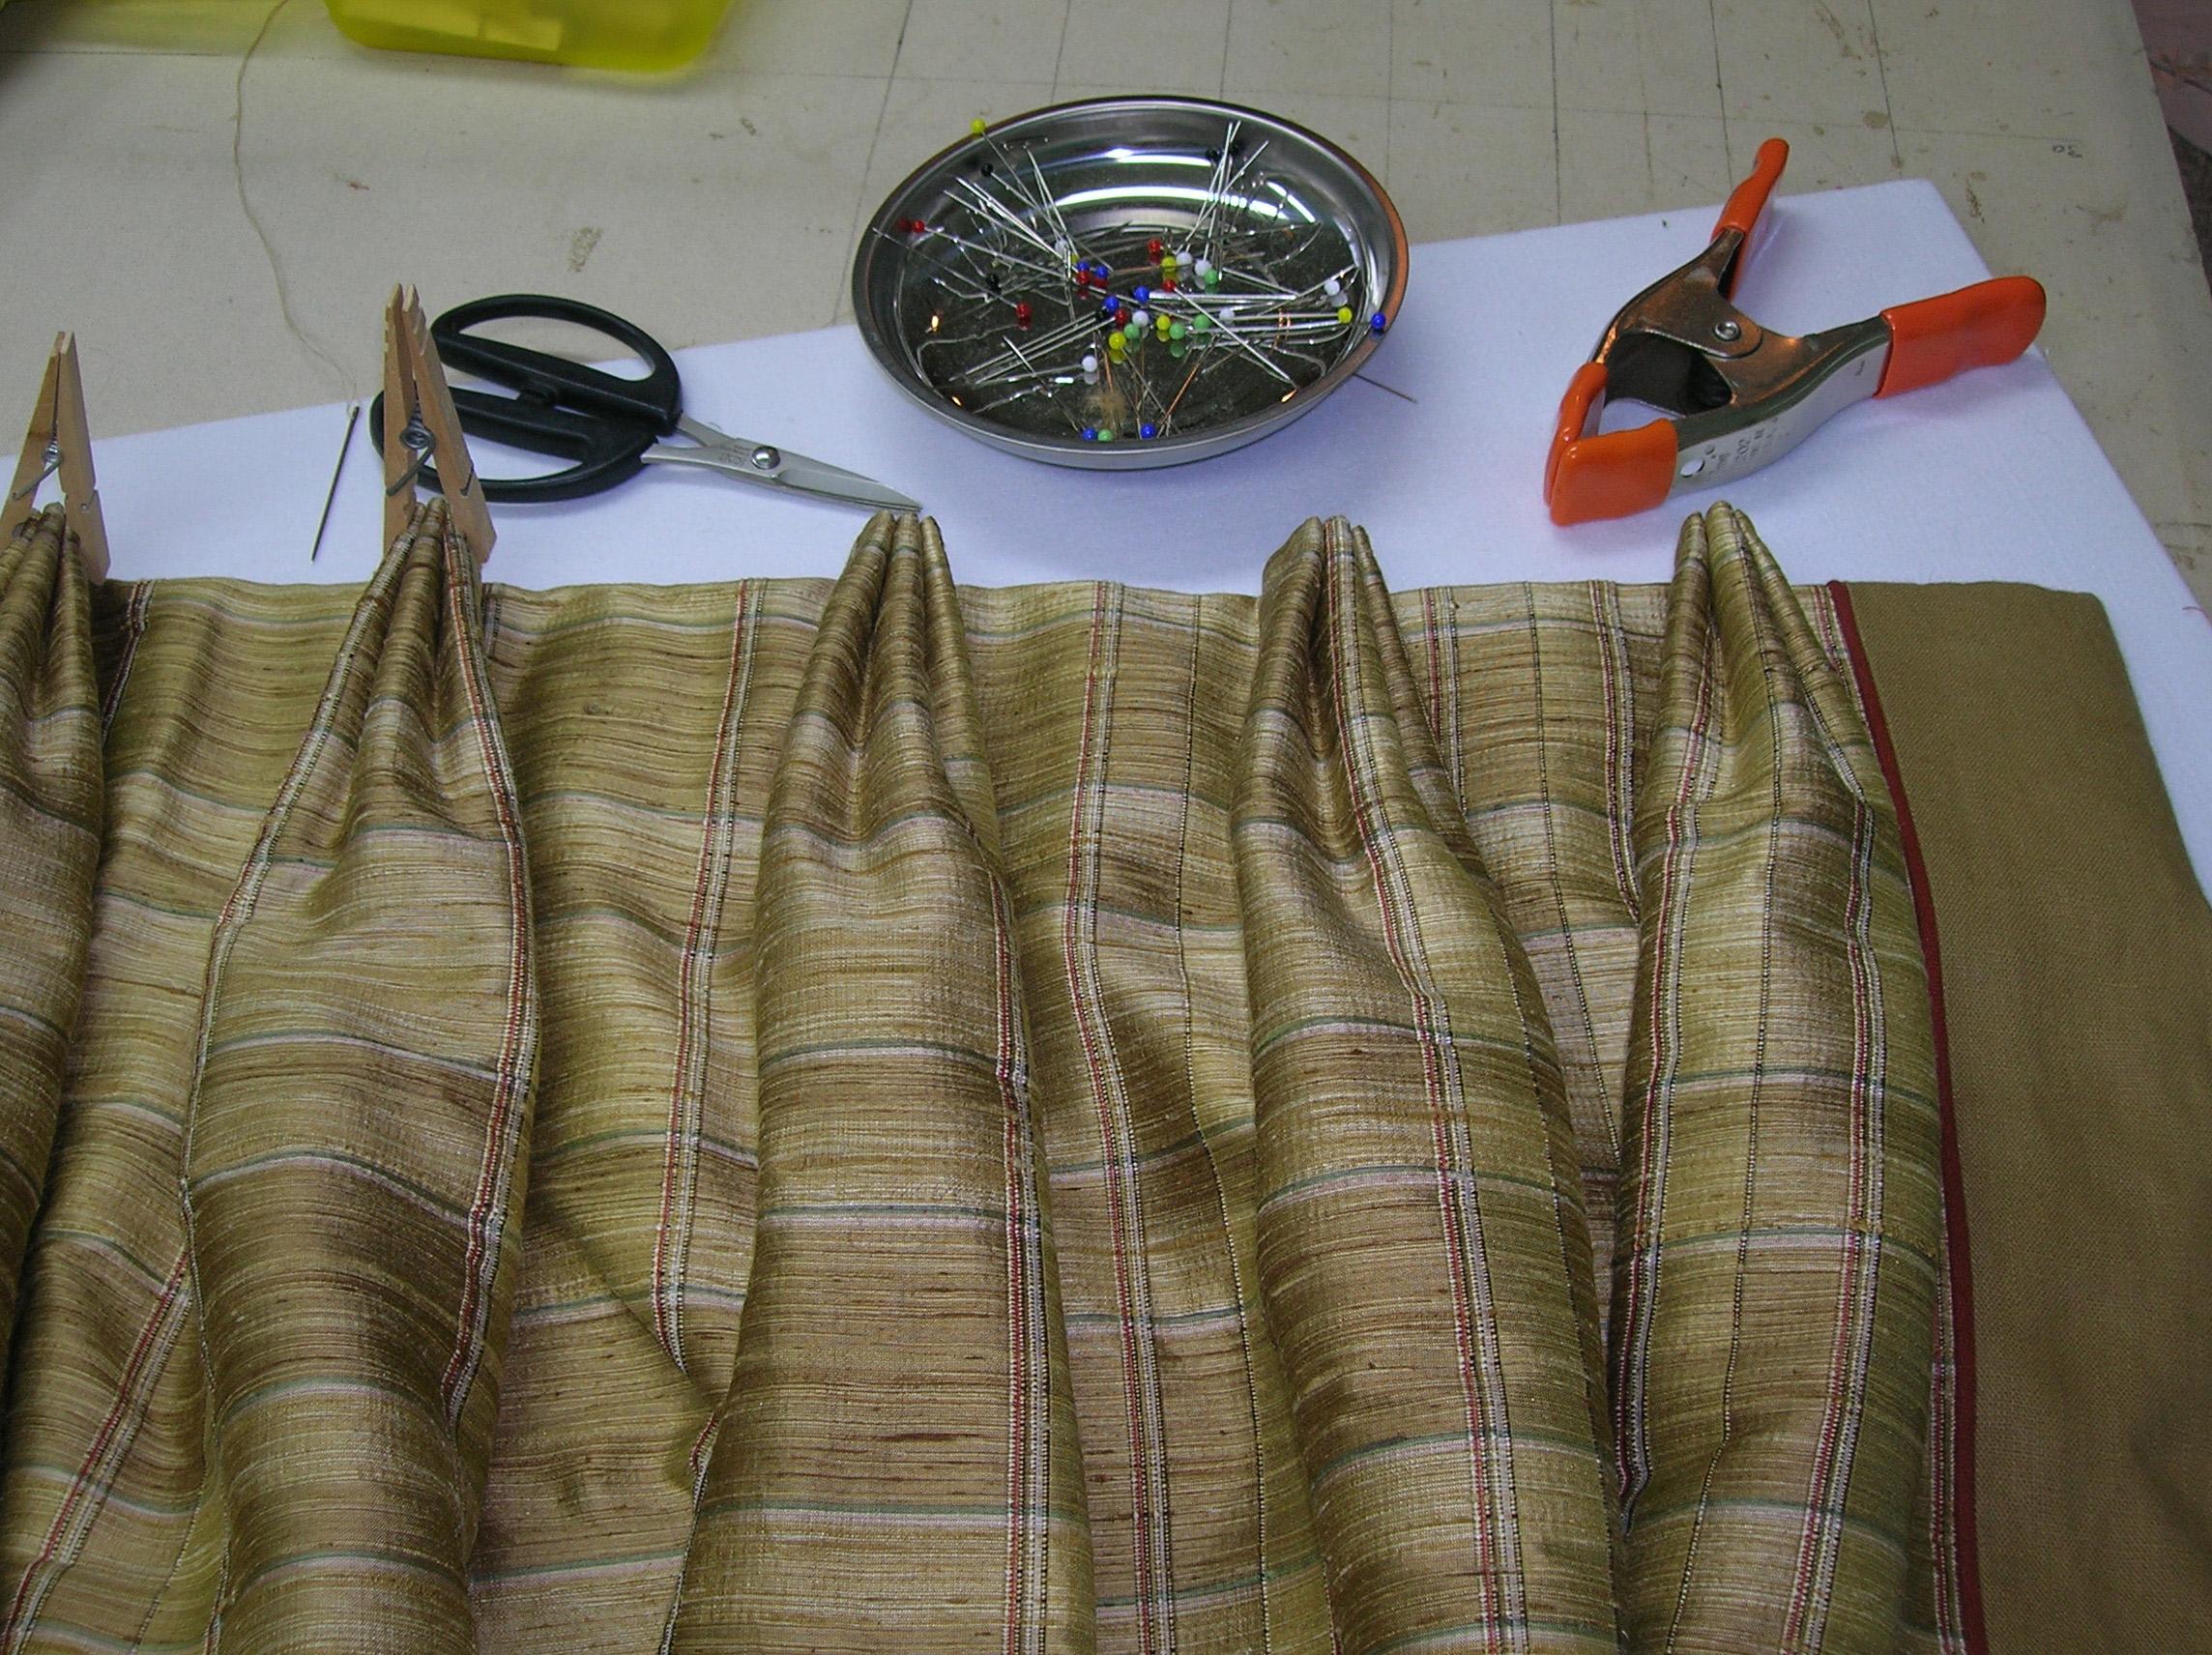 The dePasquale Design fabrication process